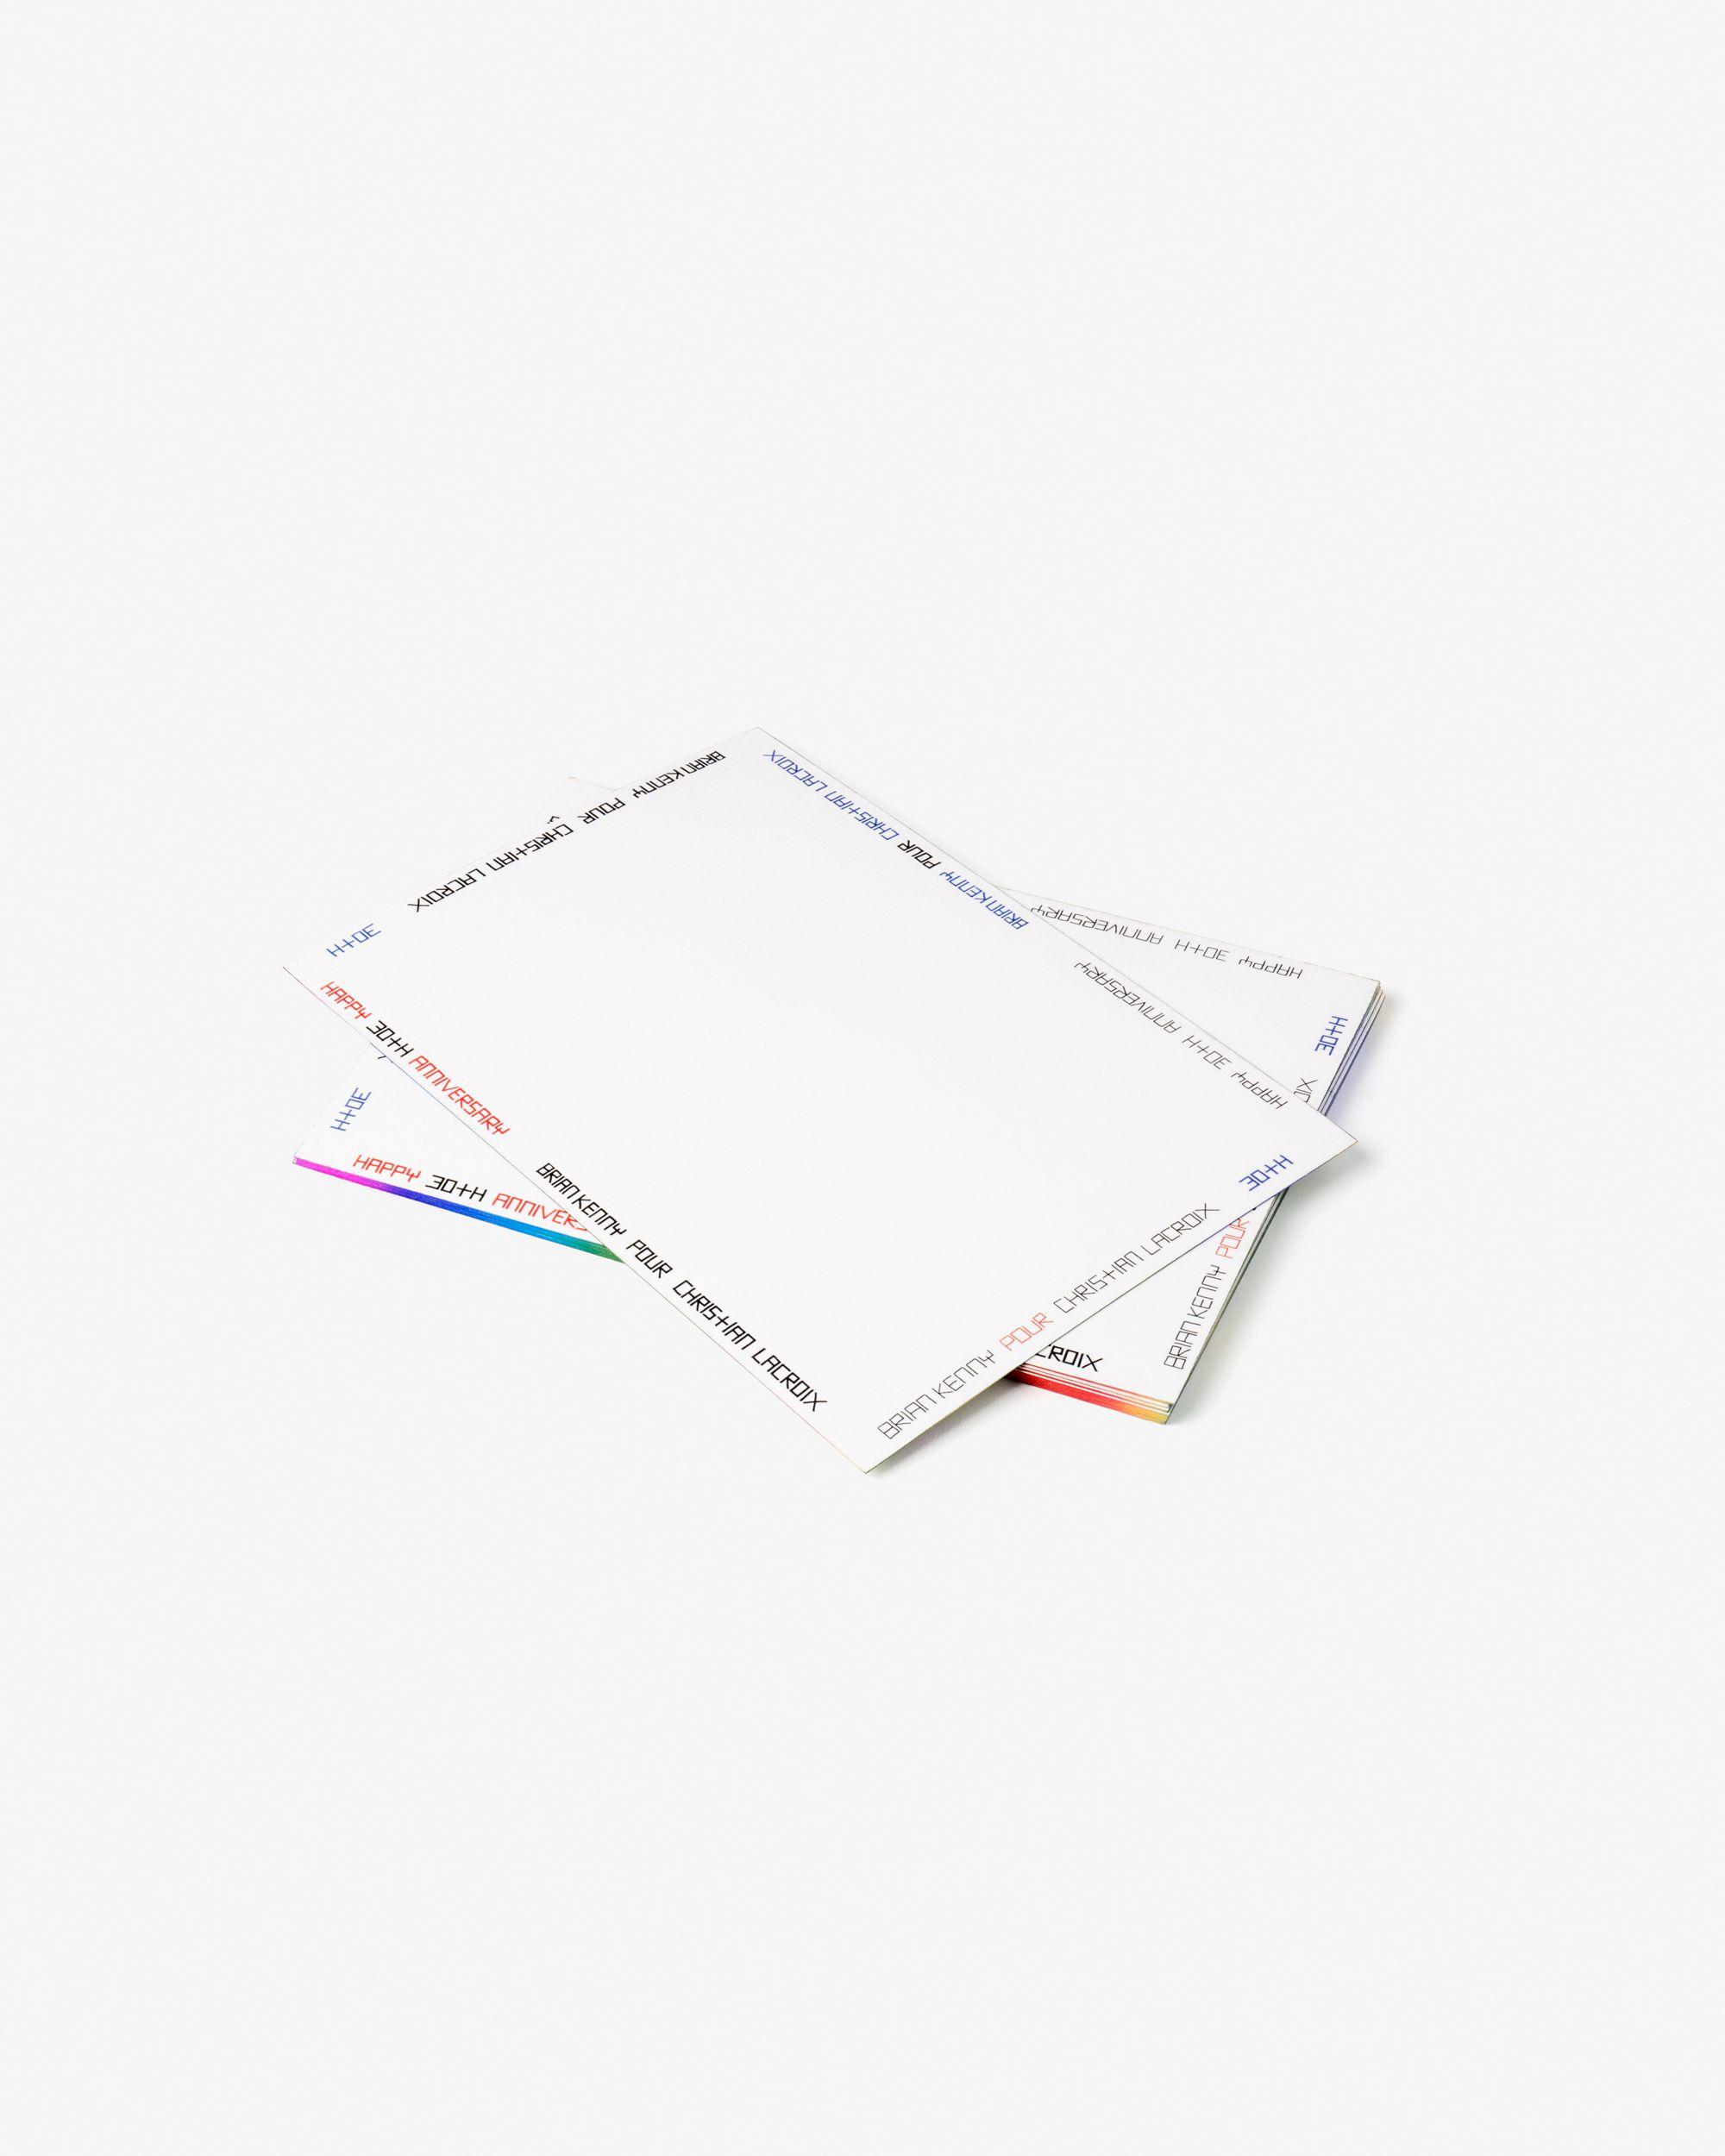 Lacroix_30_ans_CL_x_BK_Postcard_back_5a04246db2368.jpg